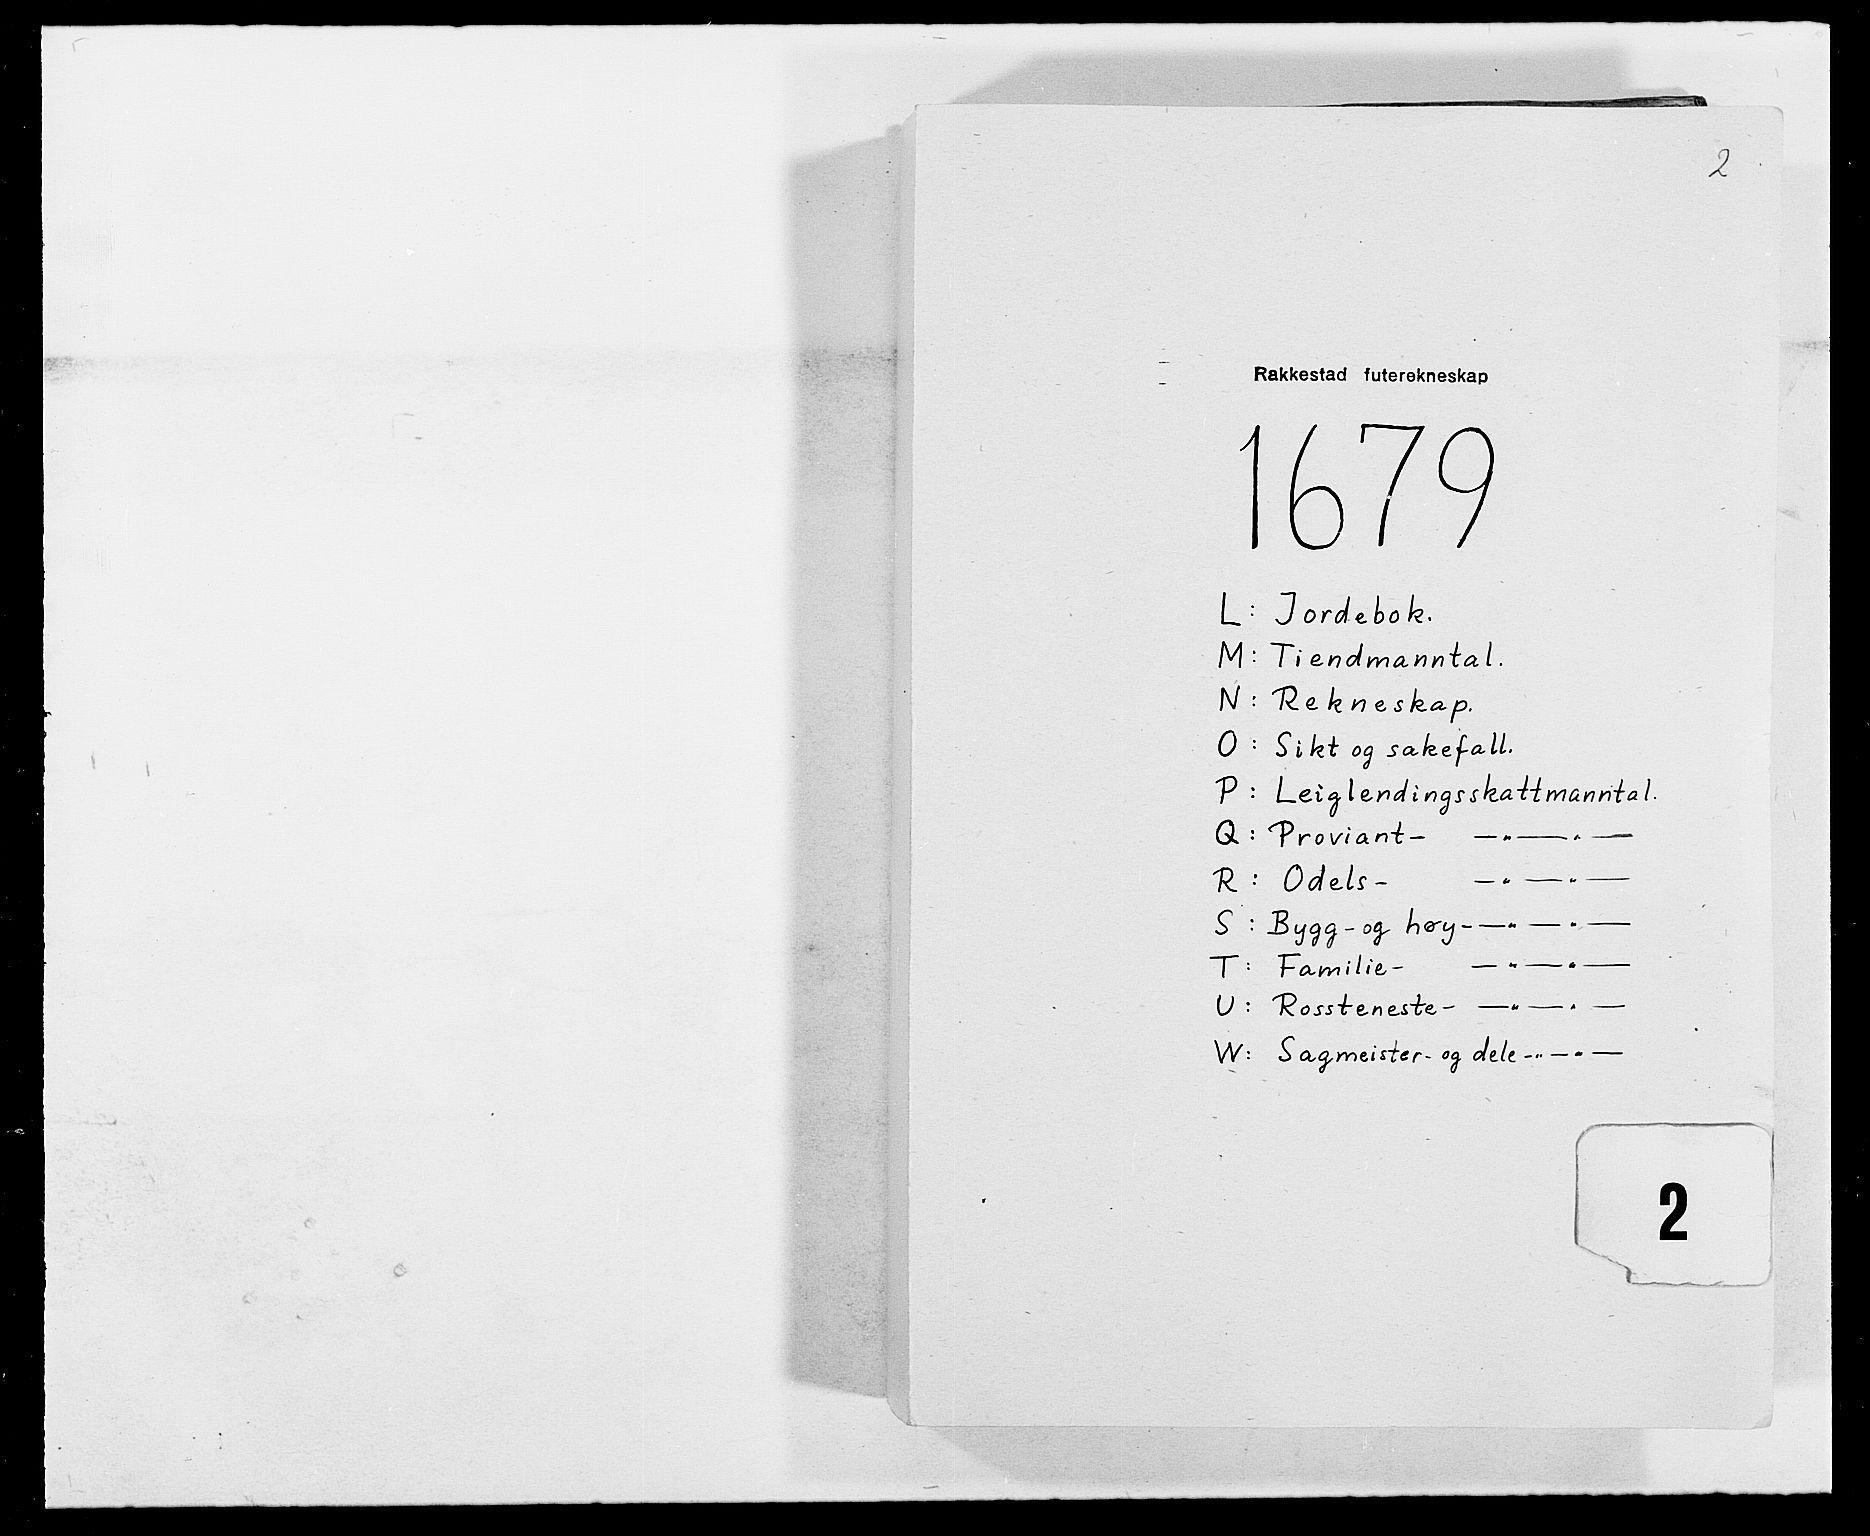 RA, Rentekammeret inntil 1814, Reviderte regnskaper, Fogderegnskap, R05/L0271: Fogderegnskap Rakkestad, 1678-1679, s. 248